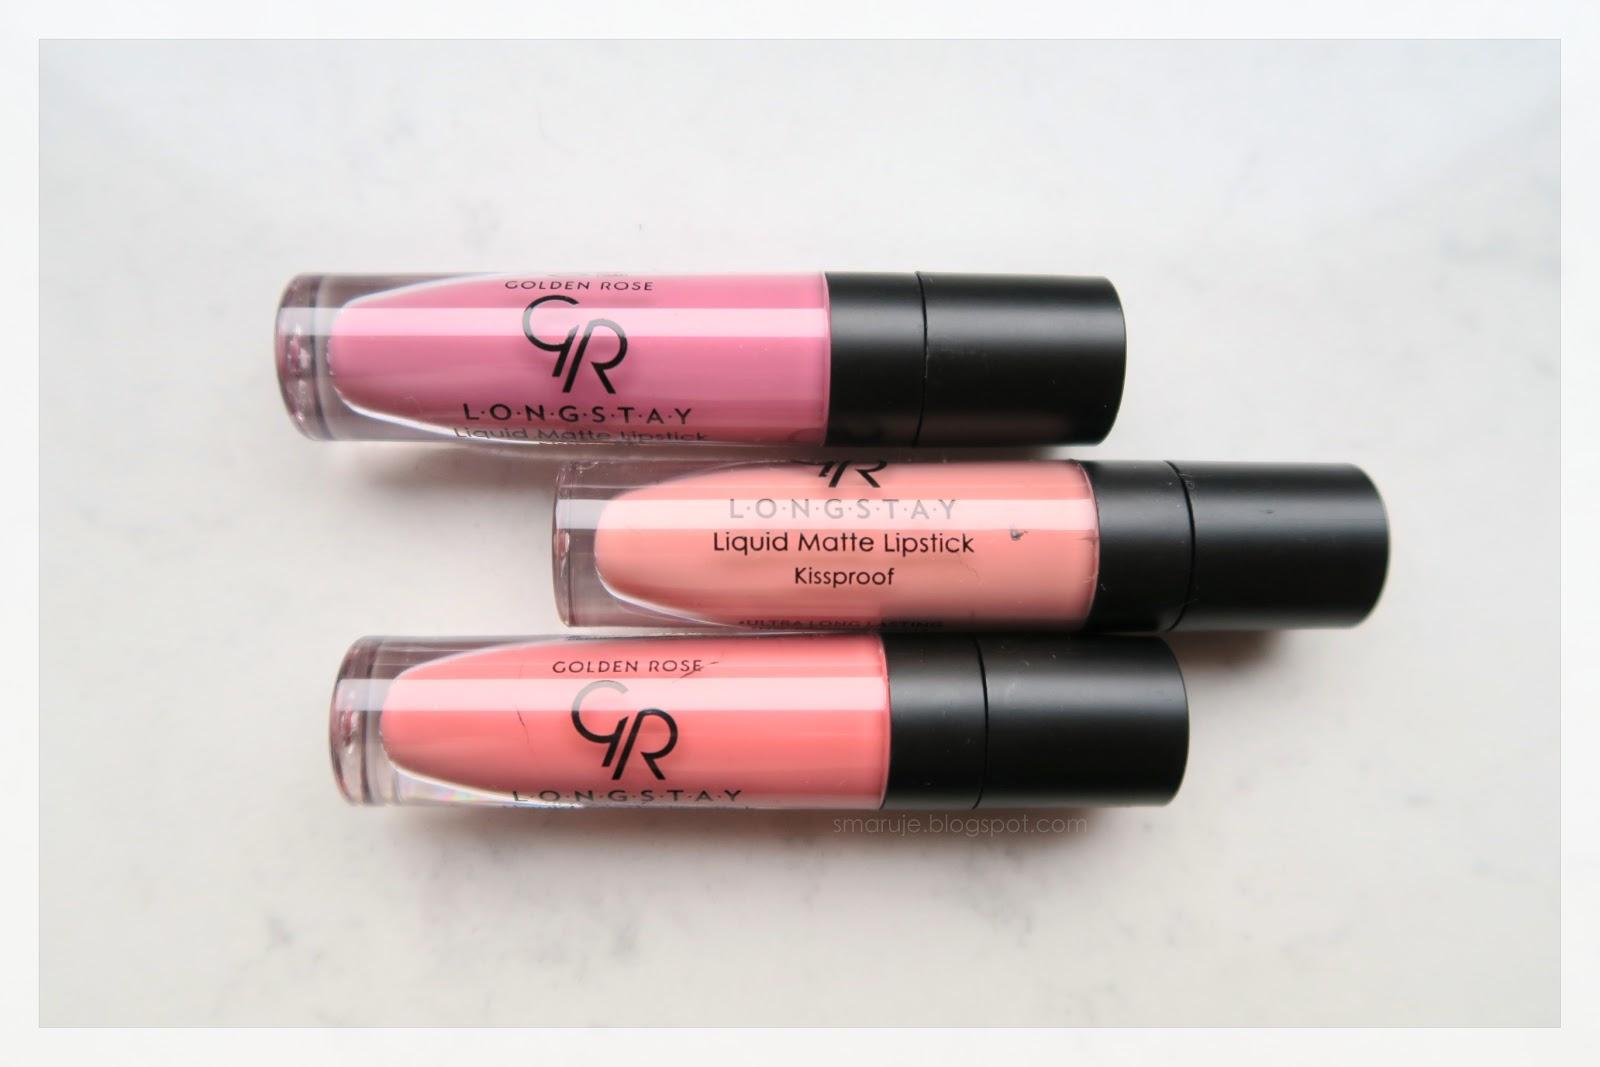 Golden Rose Longstay Liquid Matte Lipstick, odcienie 03, 13, 17 –jak wiele mają wspólnego z Milani Amore Matte?